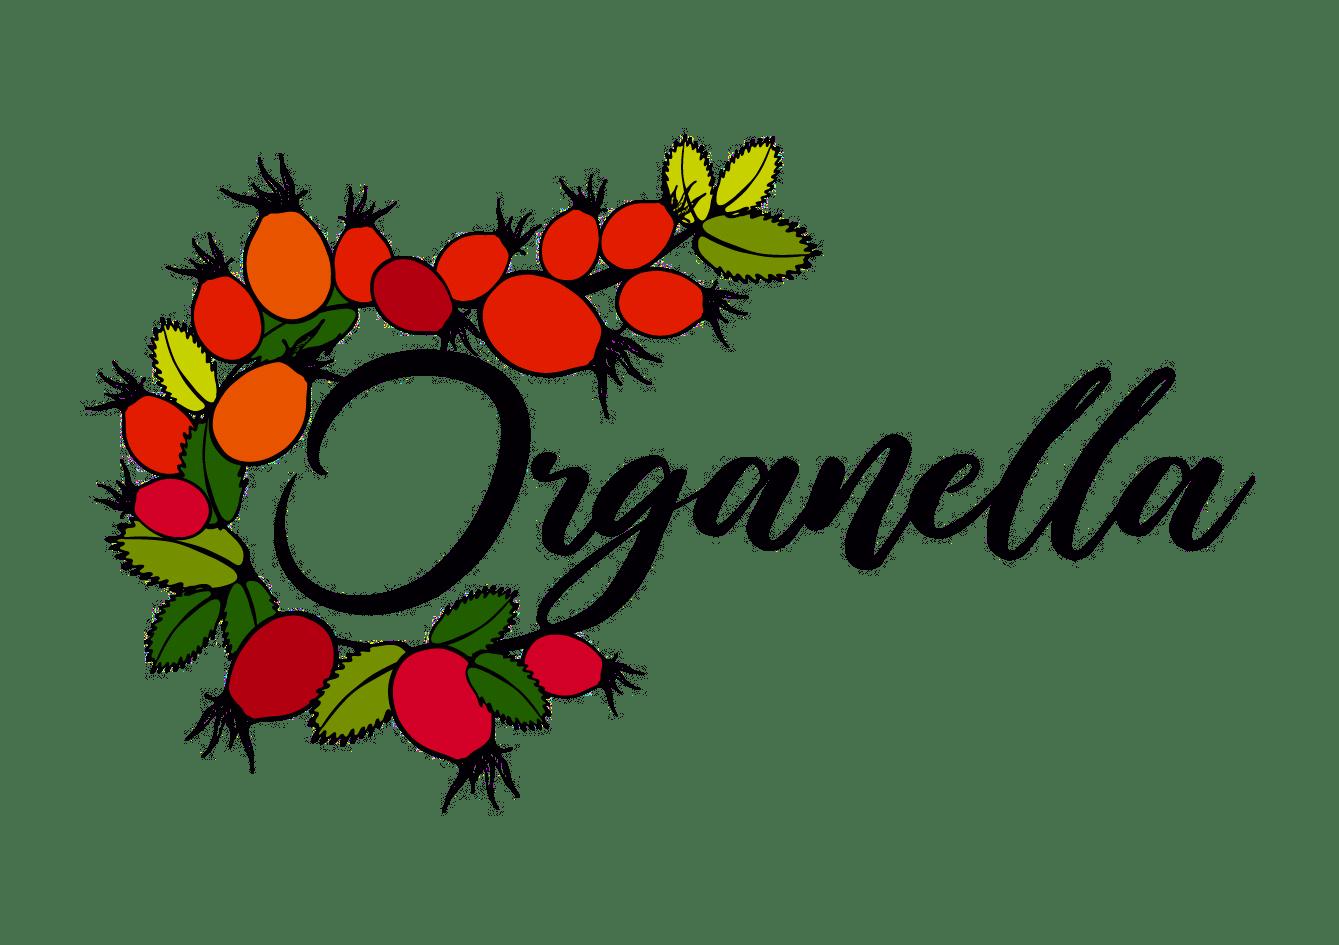 Organella